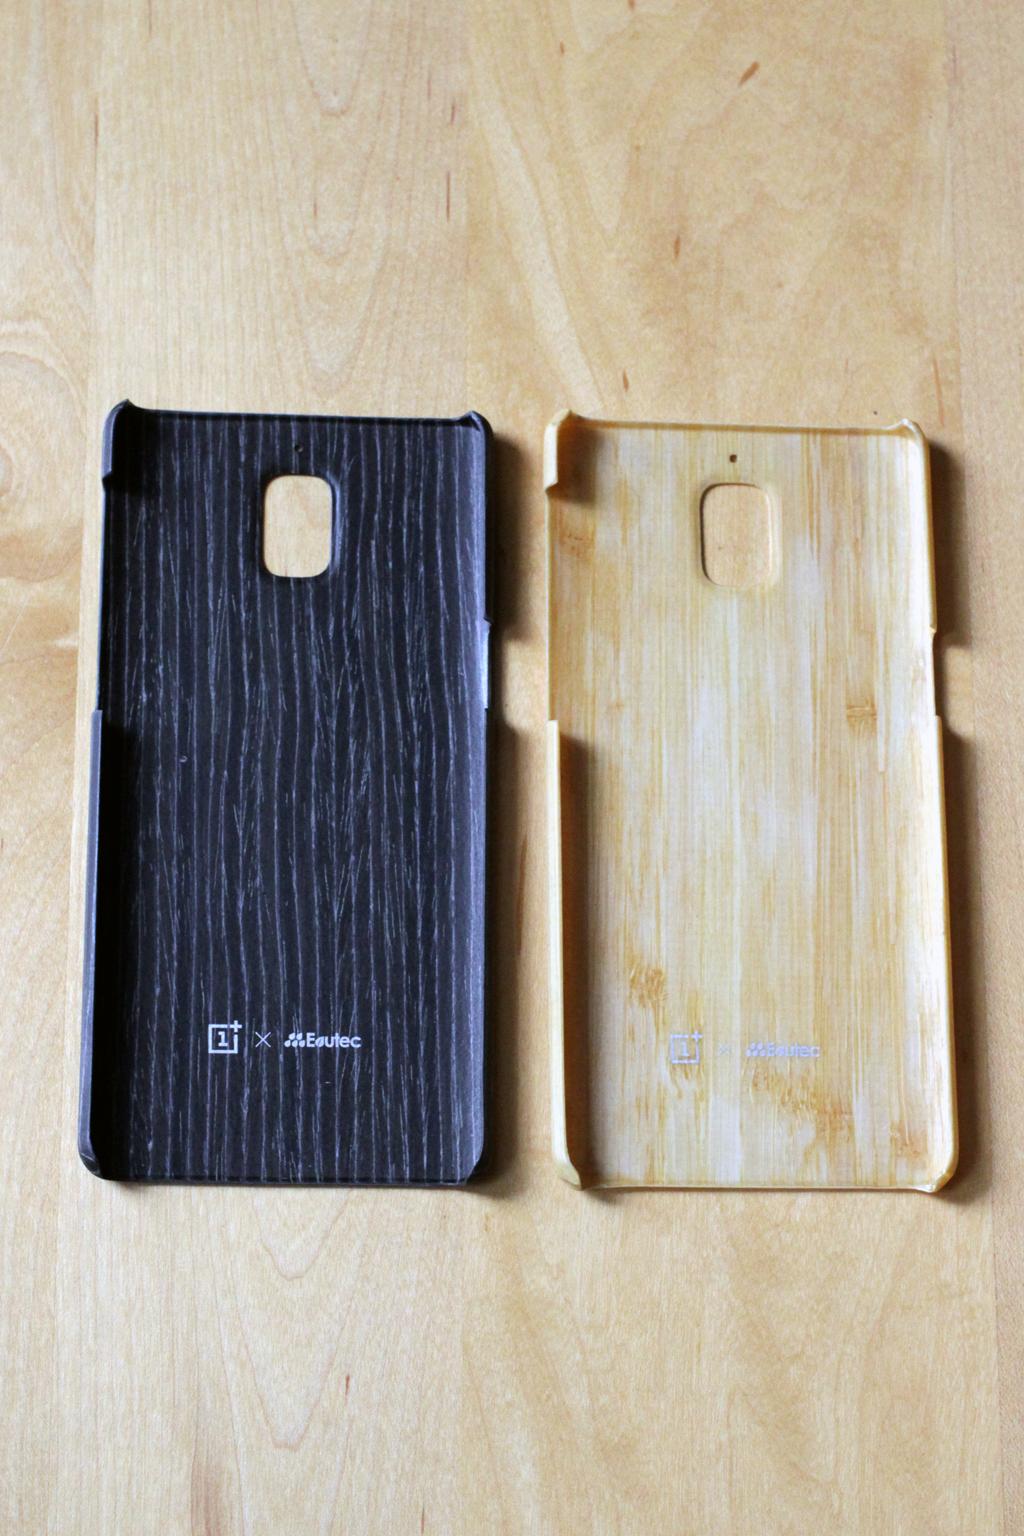 OnePlus 3 Black Apricot Case